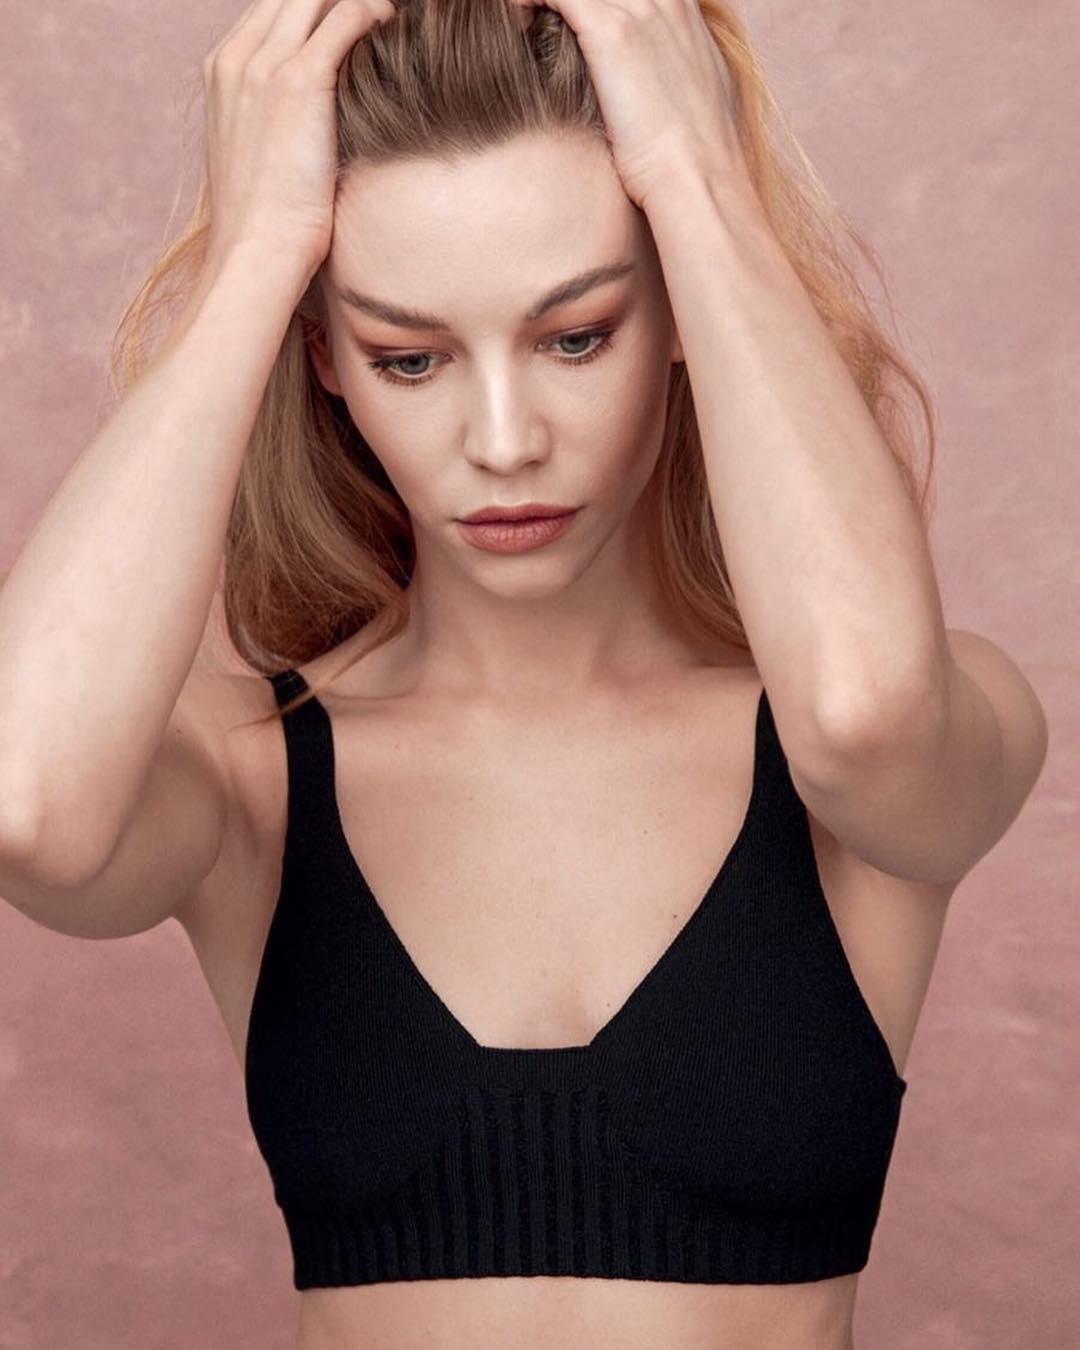 Светлана Устинова: @gqrussia   June issue photo @danilgolovkin Style @anichkinadasha Makeup @andreyshilkov Hair @nataliakovalenkova Producer @chibisova_